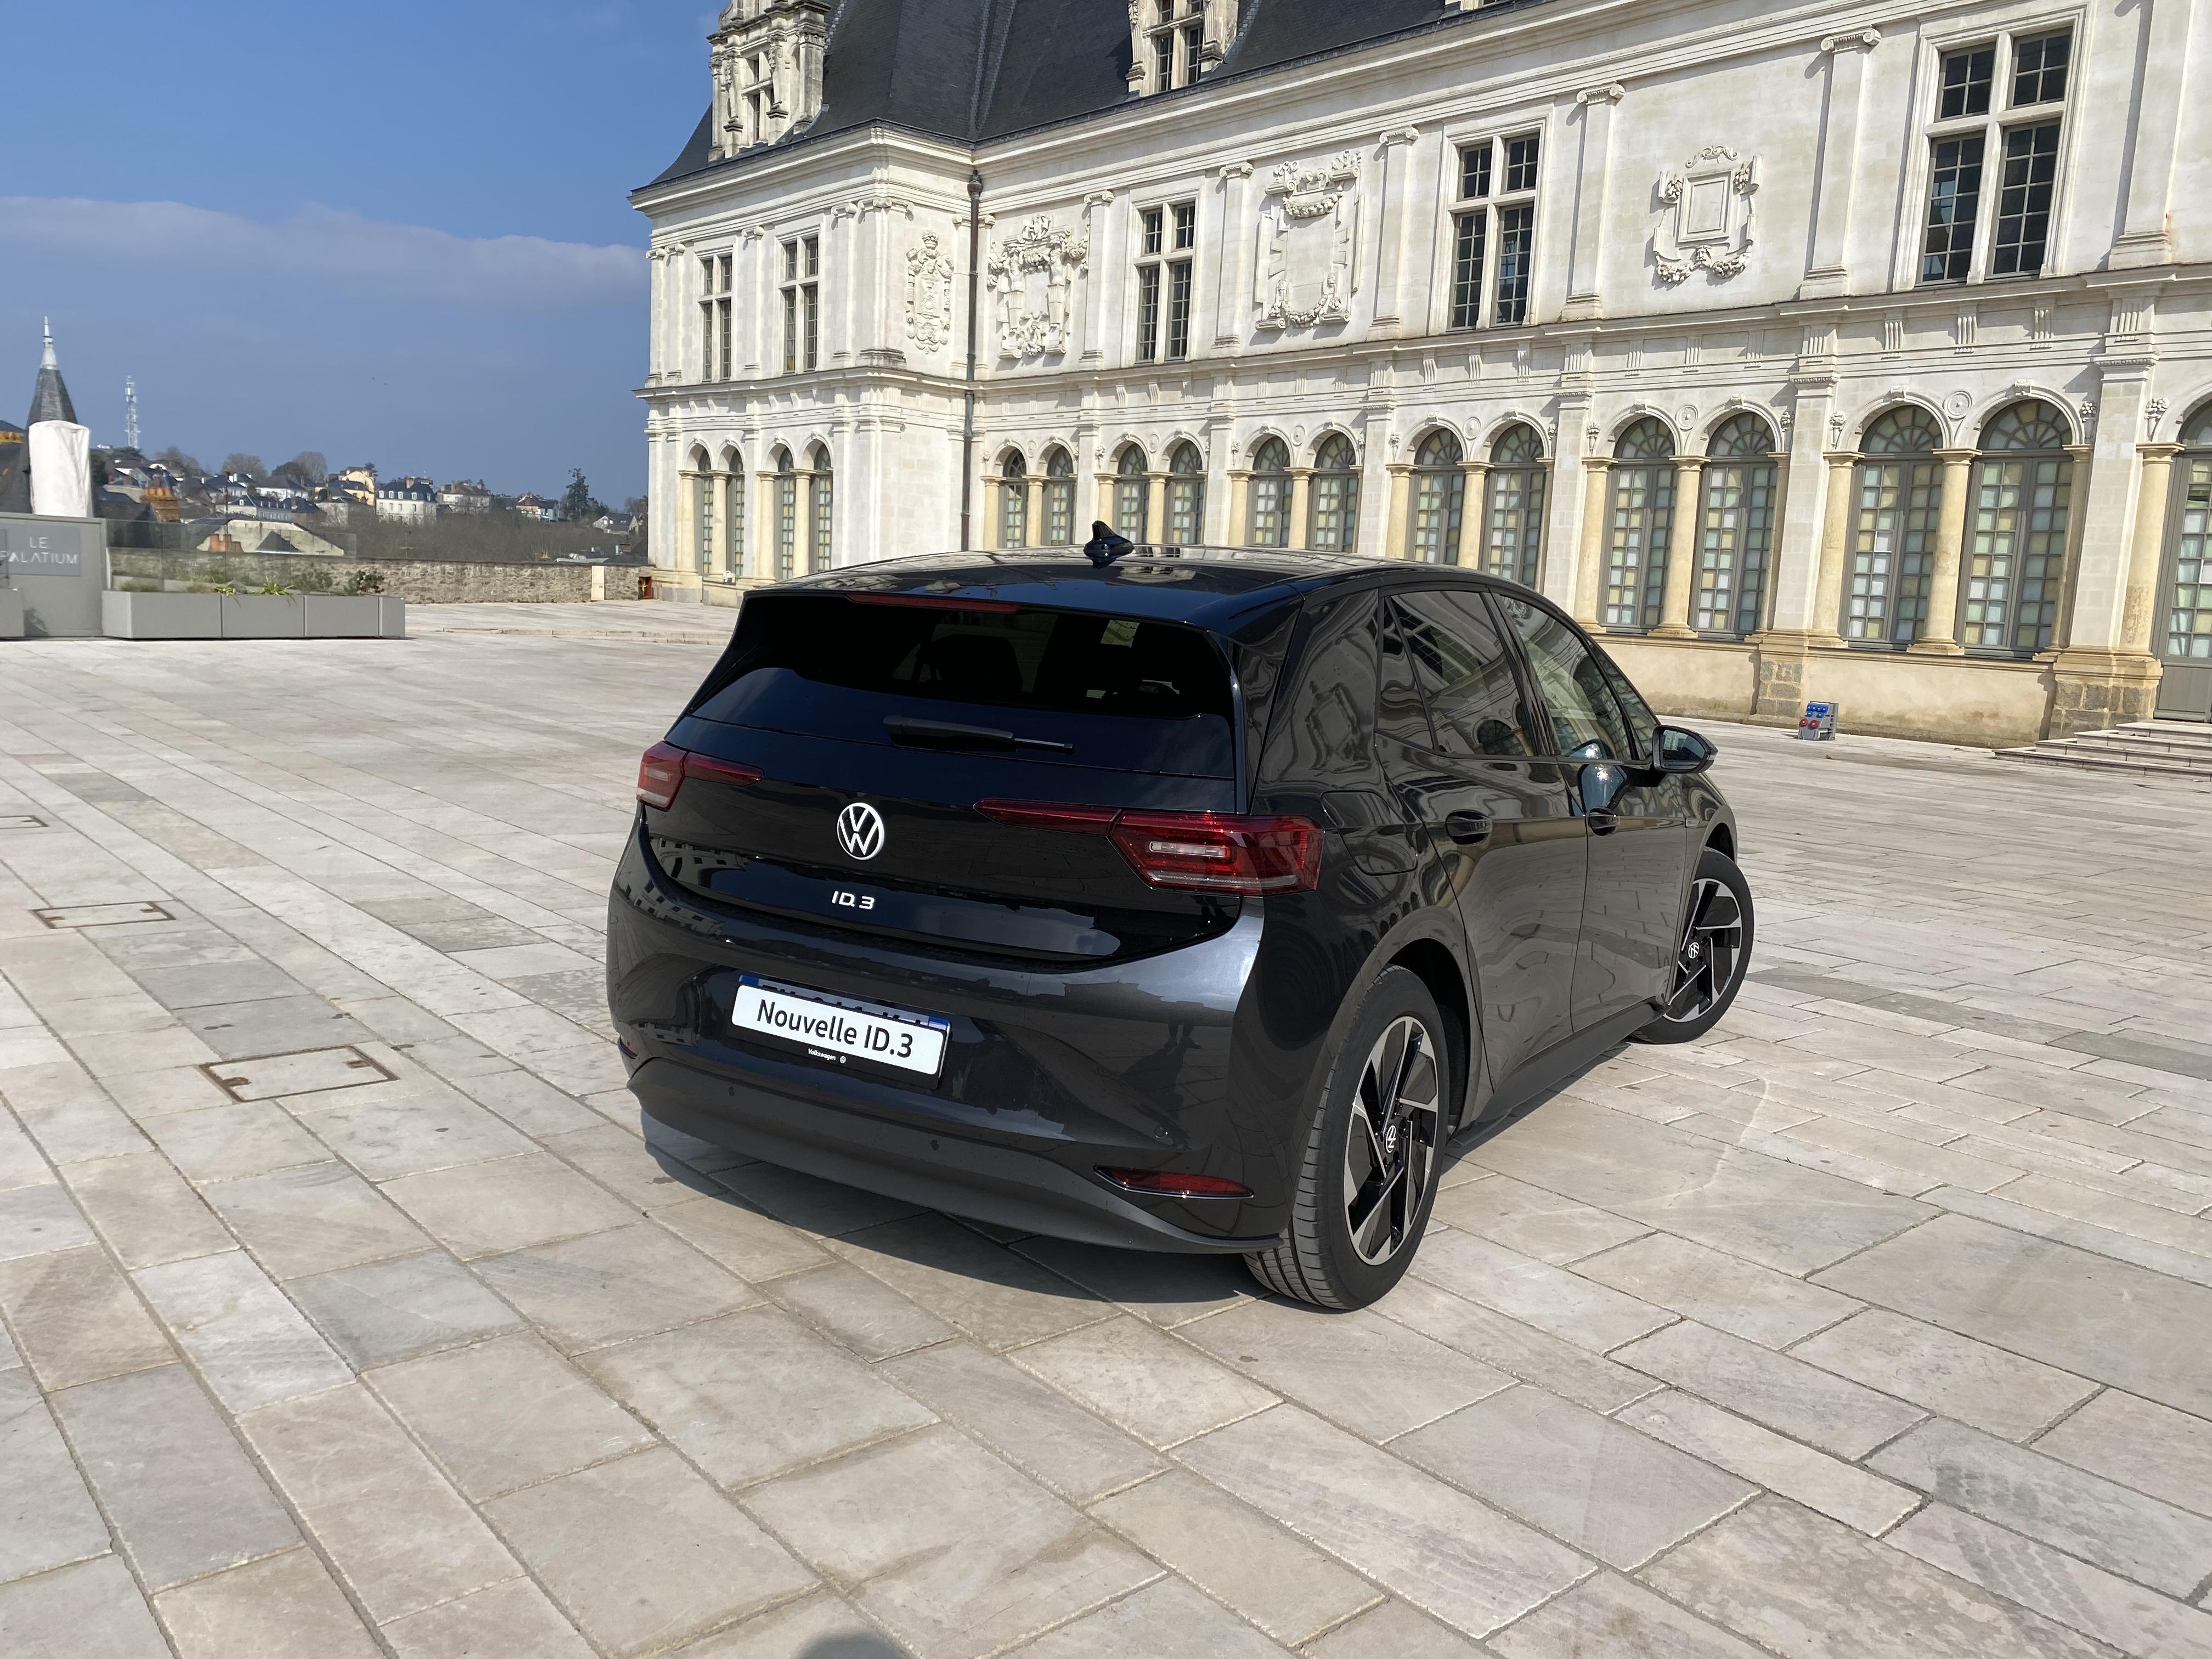 Offre du moment Volkswagen ID.3 Laval